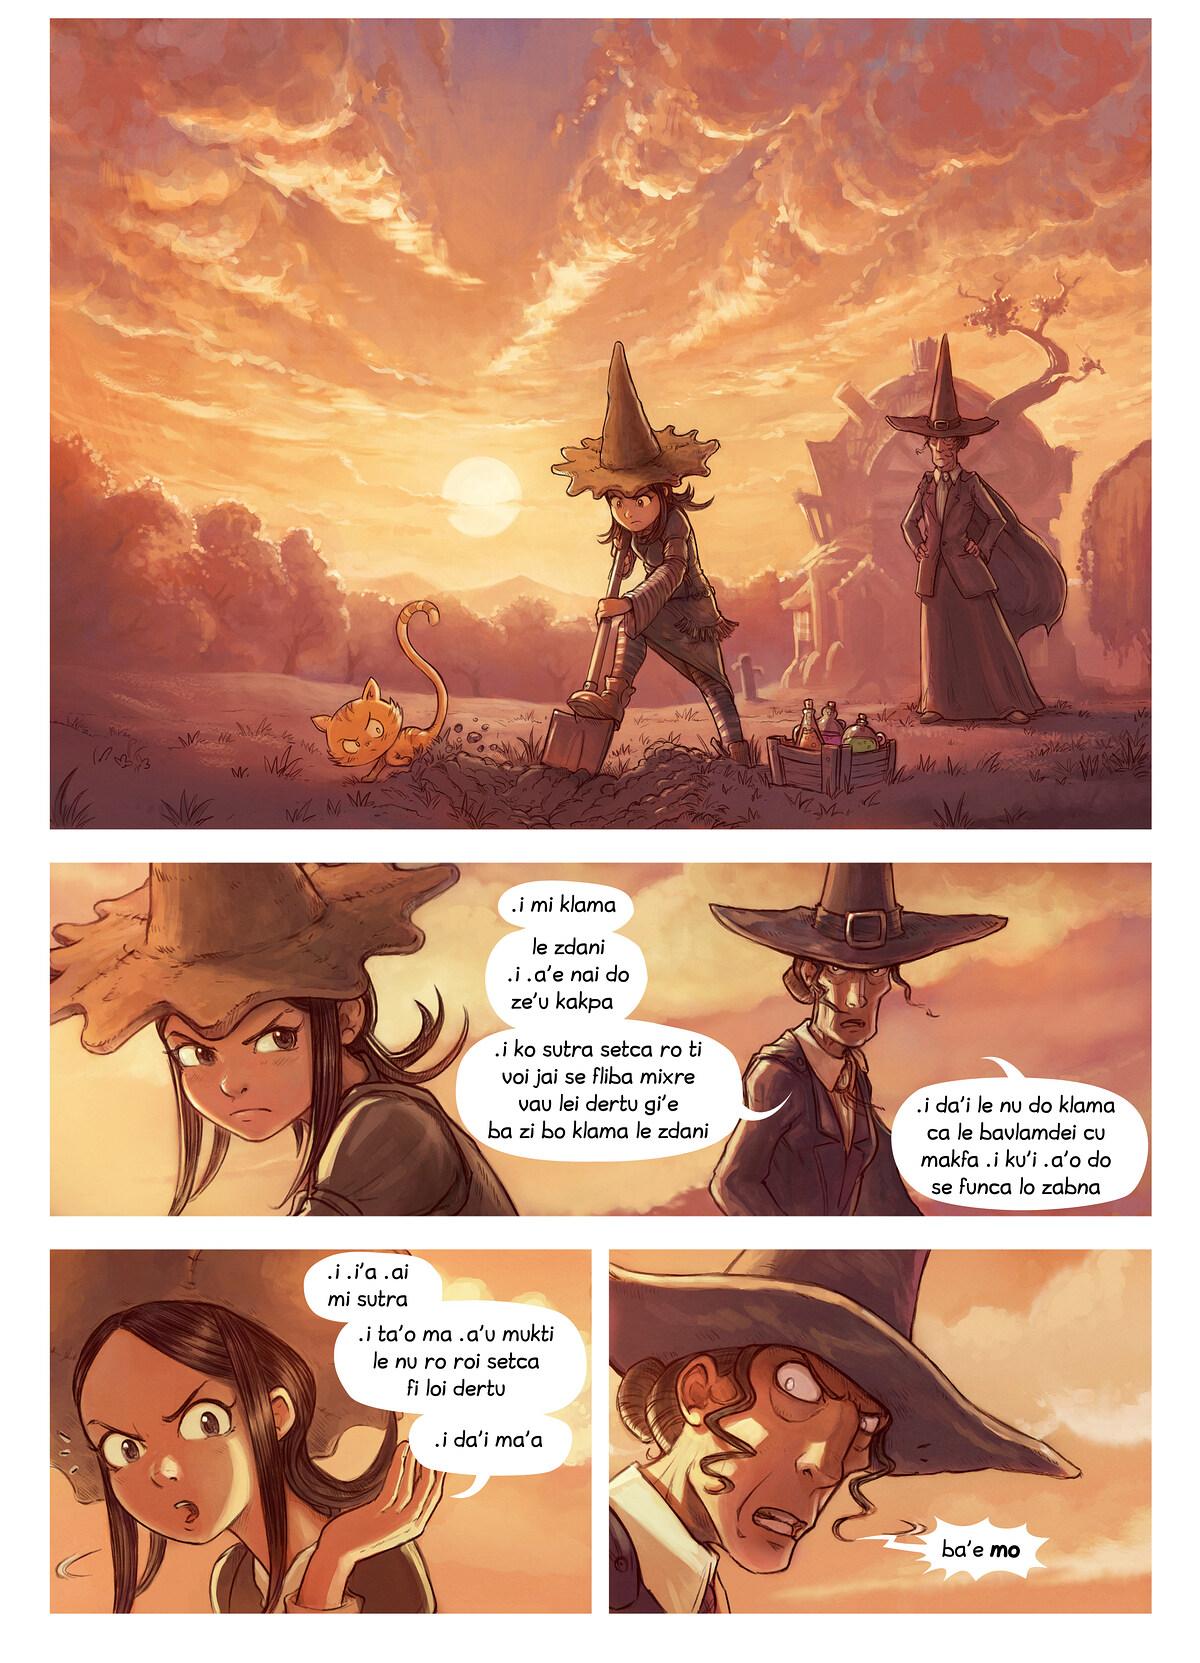 A webcomic page of Pepper&Carrot, pagbu 19 [jb], papri 1